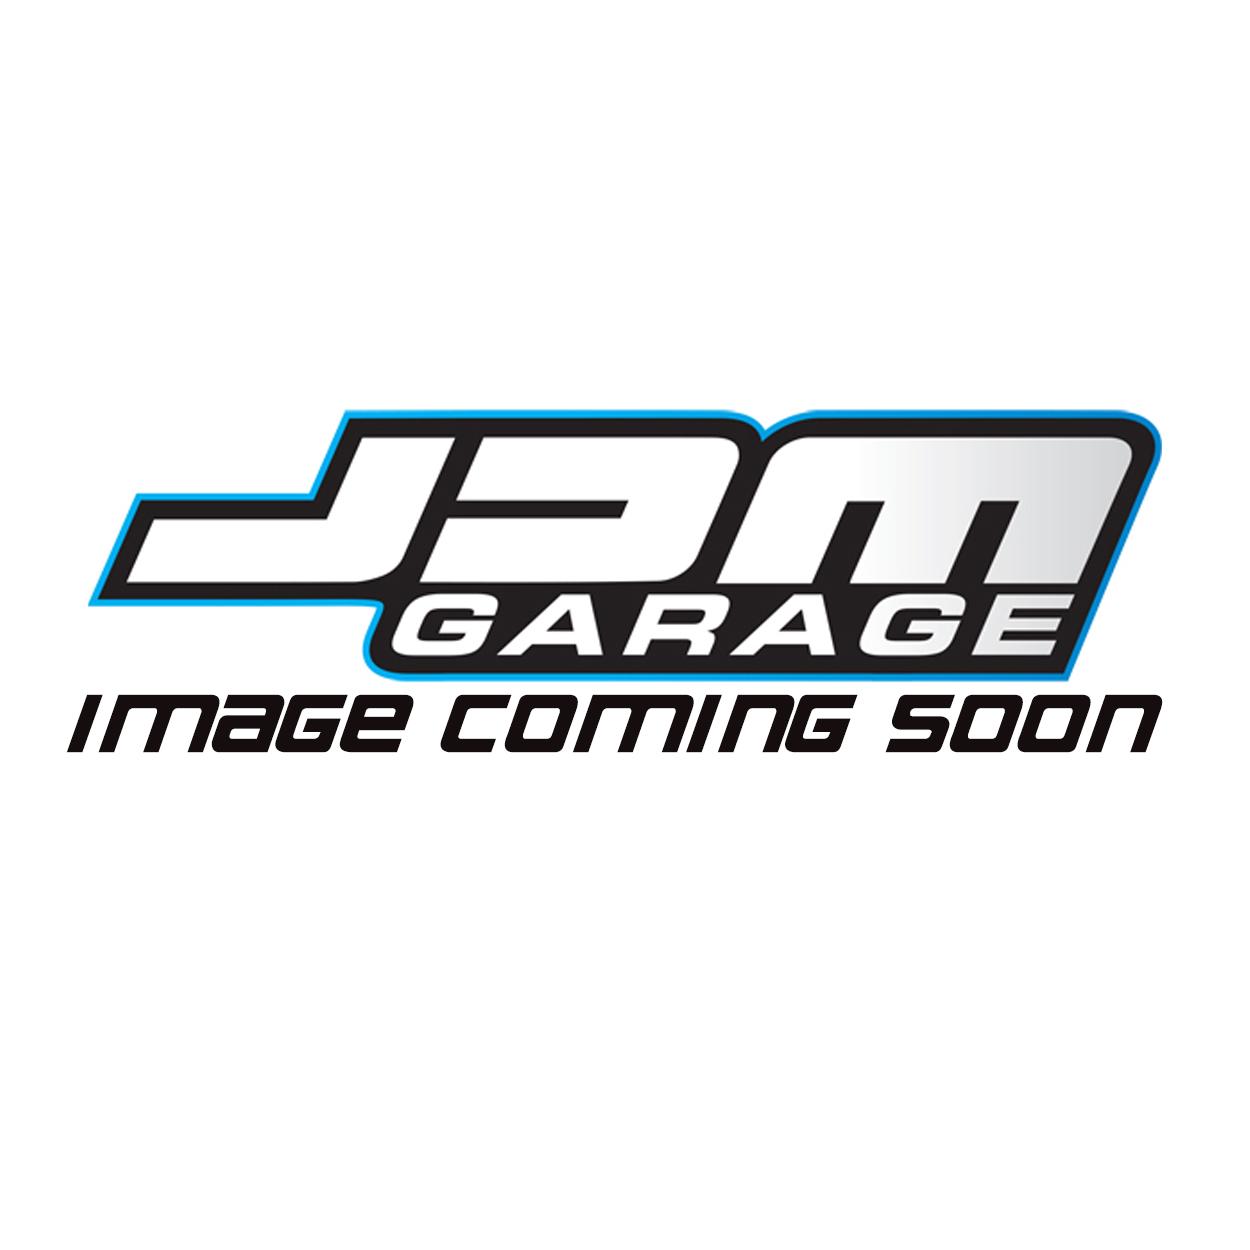 Haltech Elite 2500+ ECU Toyota Chaser / Cresta / Mark II JZX100 / Soarer JZZ30 (1JZ-GTE) With Plug 'n' Play Adaptor Harness Kit